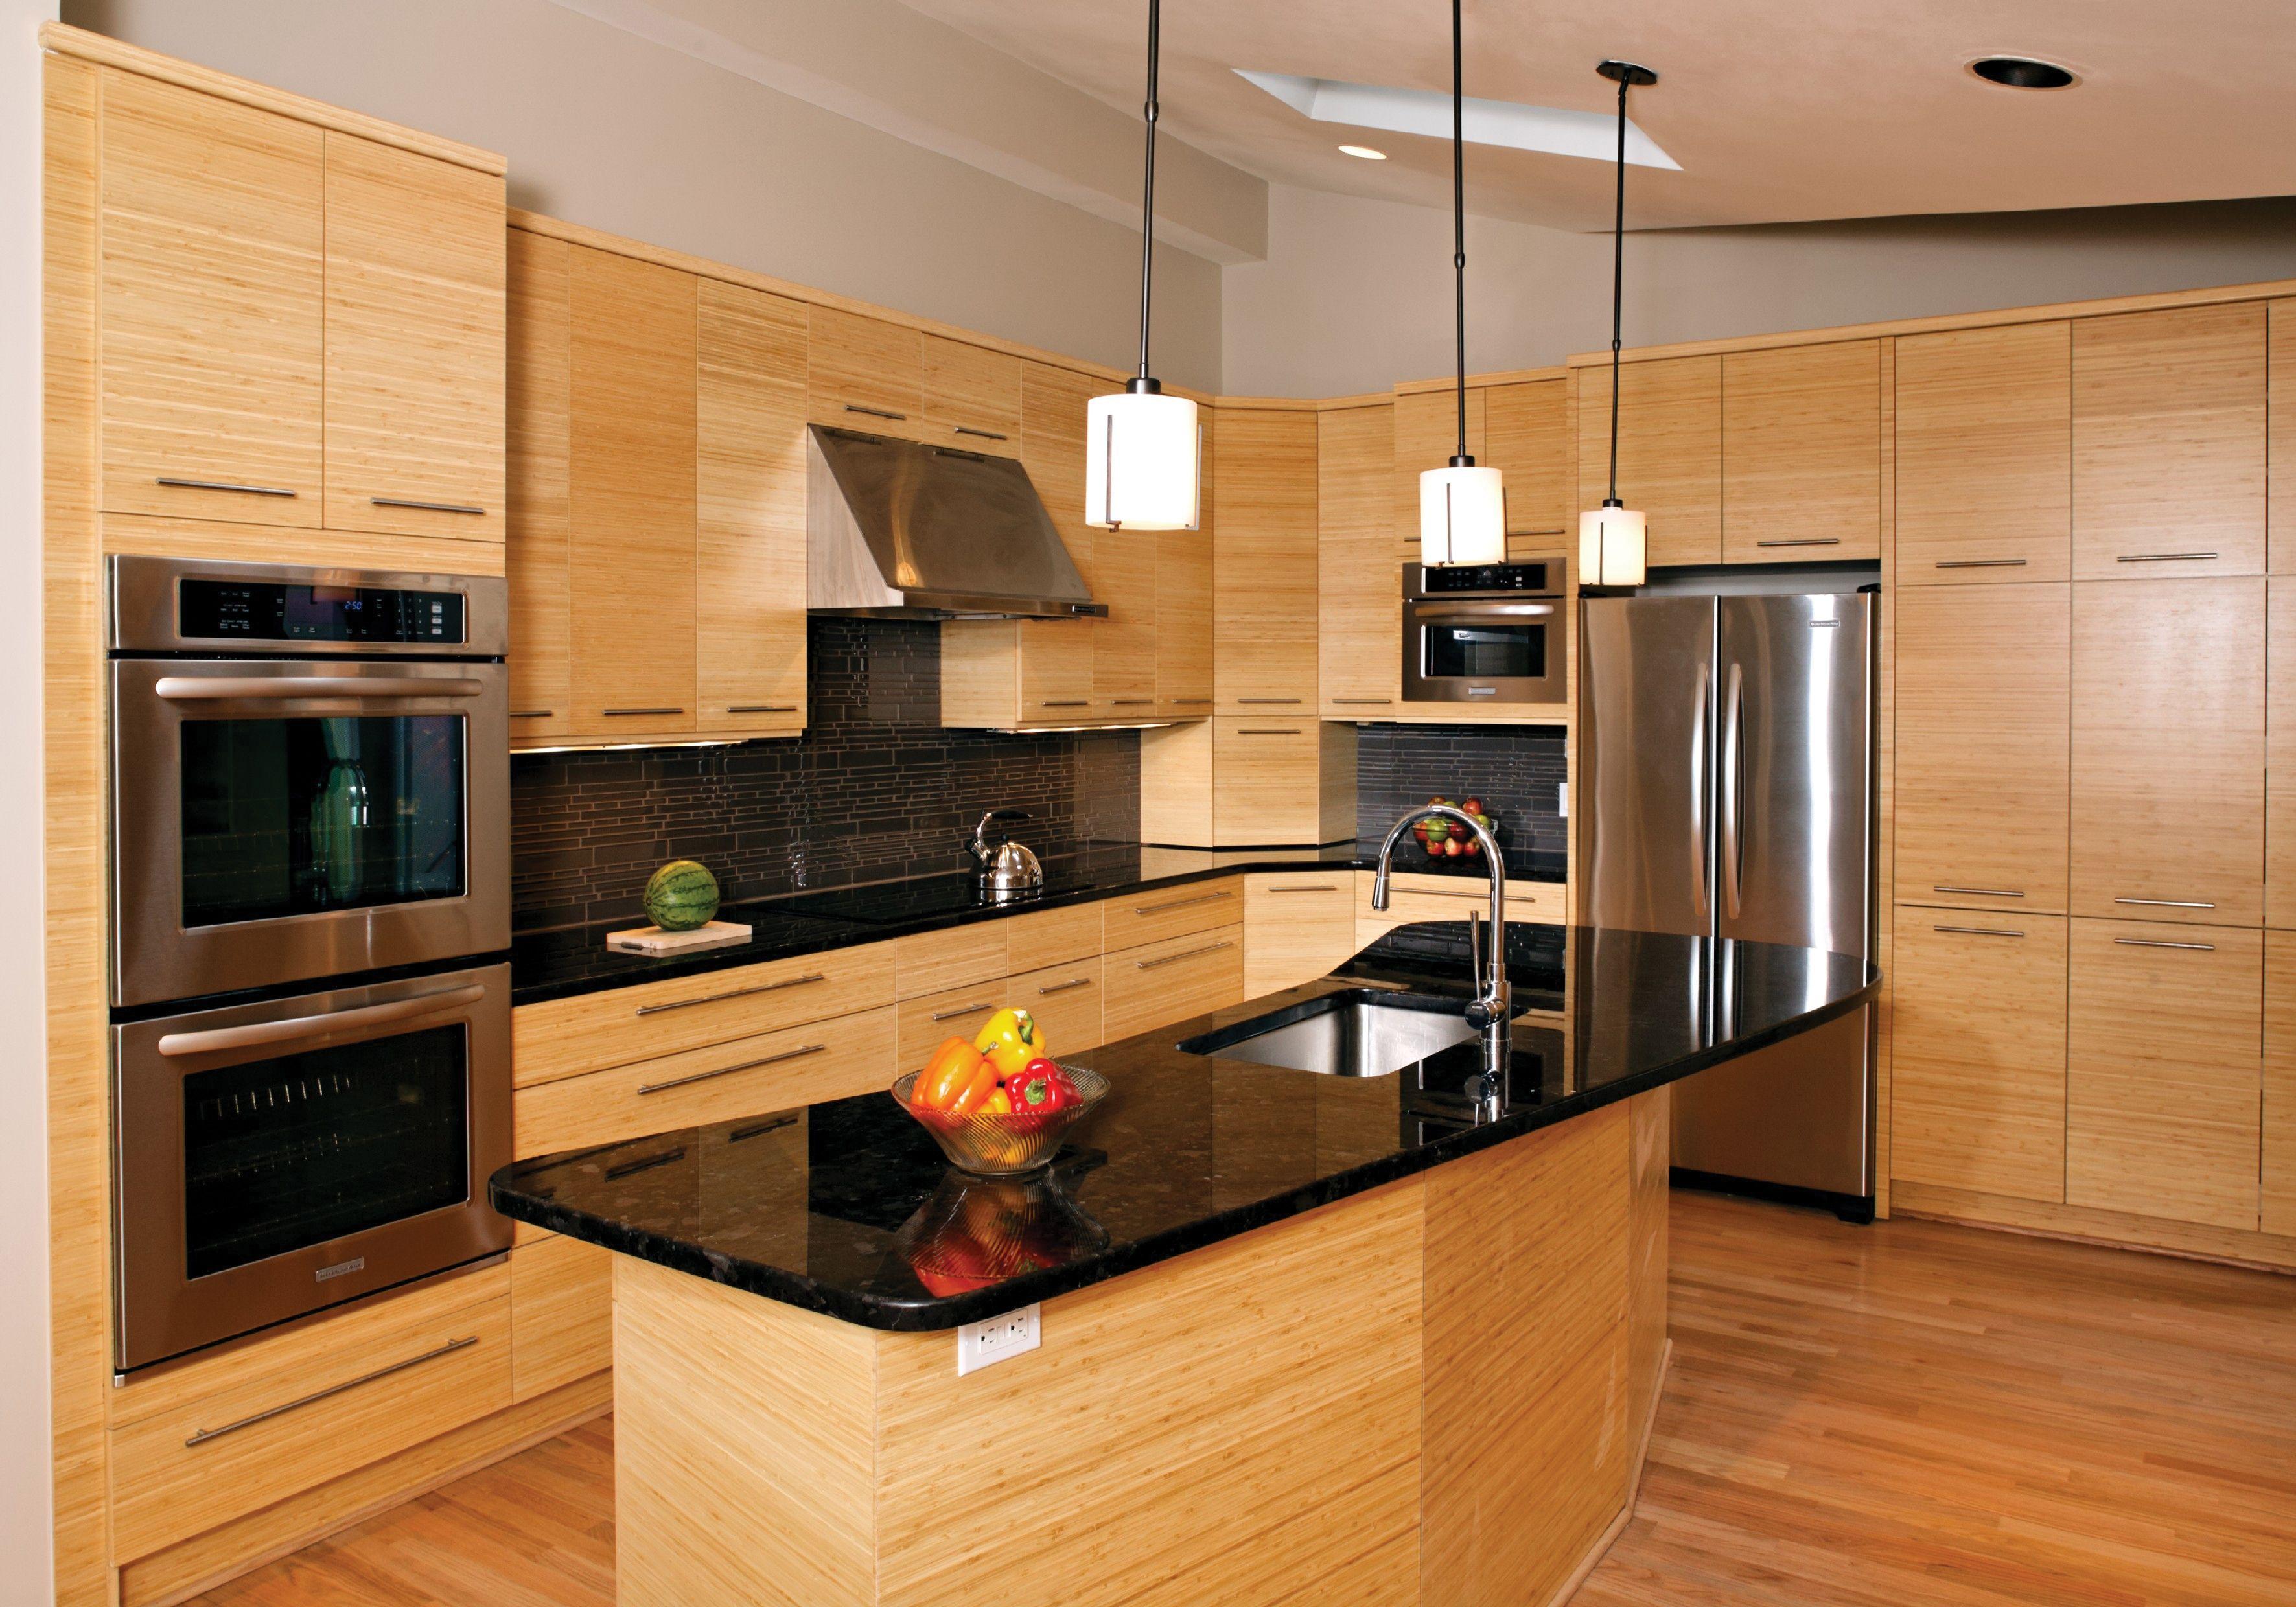 Modern Asian Kitchen Cabinets Kitchen Inspiration Design Bamboo Kitchen Cabinets Kitchen Design Small